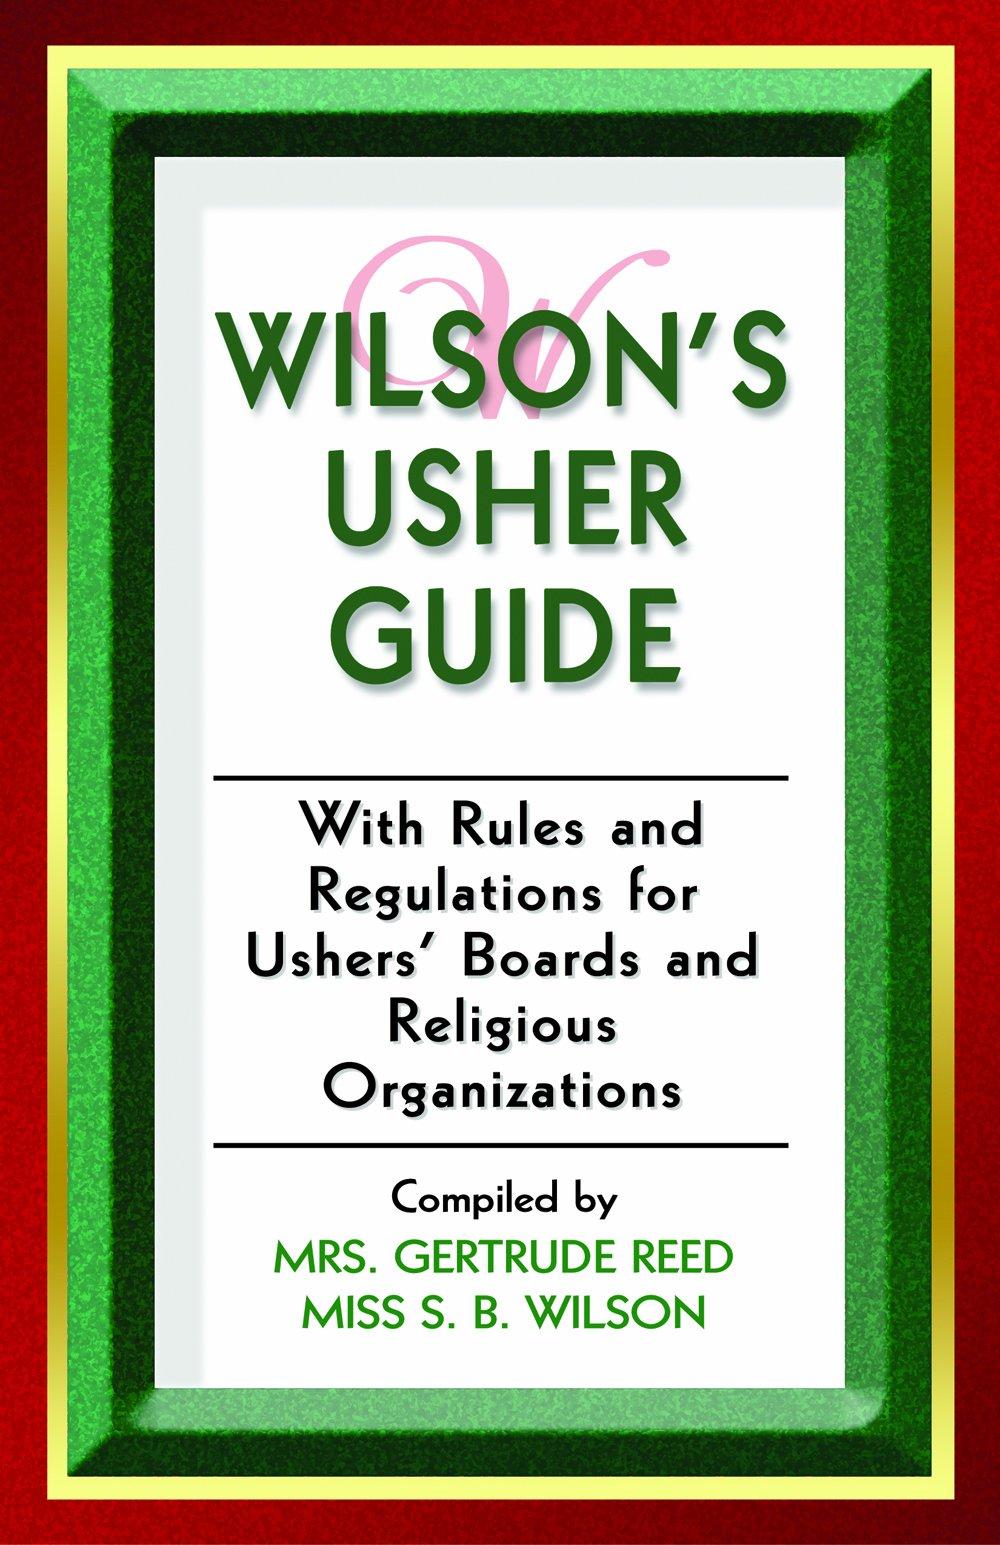 wilson s usher guide gertrude reed s b wilson 9781567420050 rh amazon com Church Usher as a Serving Church Usher as a Serving